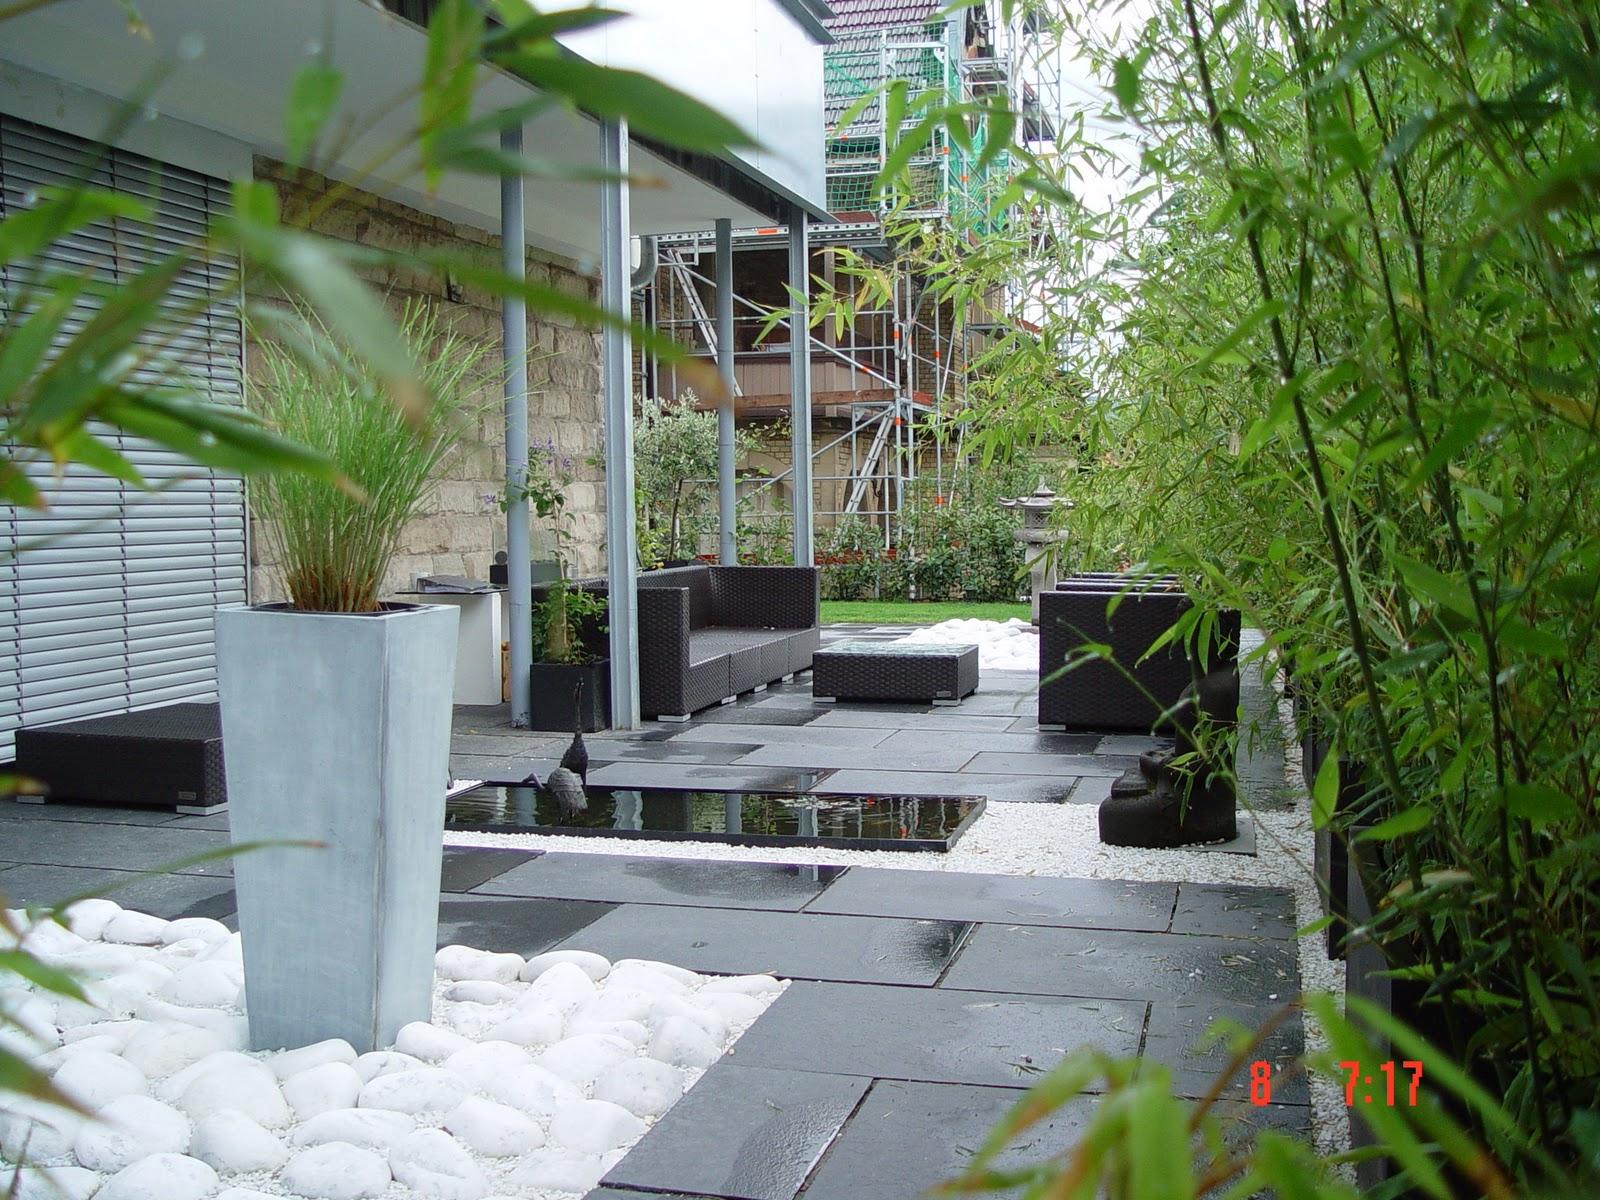 Alber gartengestaltung baustelle in stuttgart for Gartengestaltung stuttgart